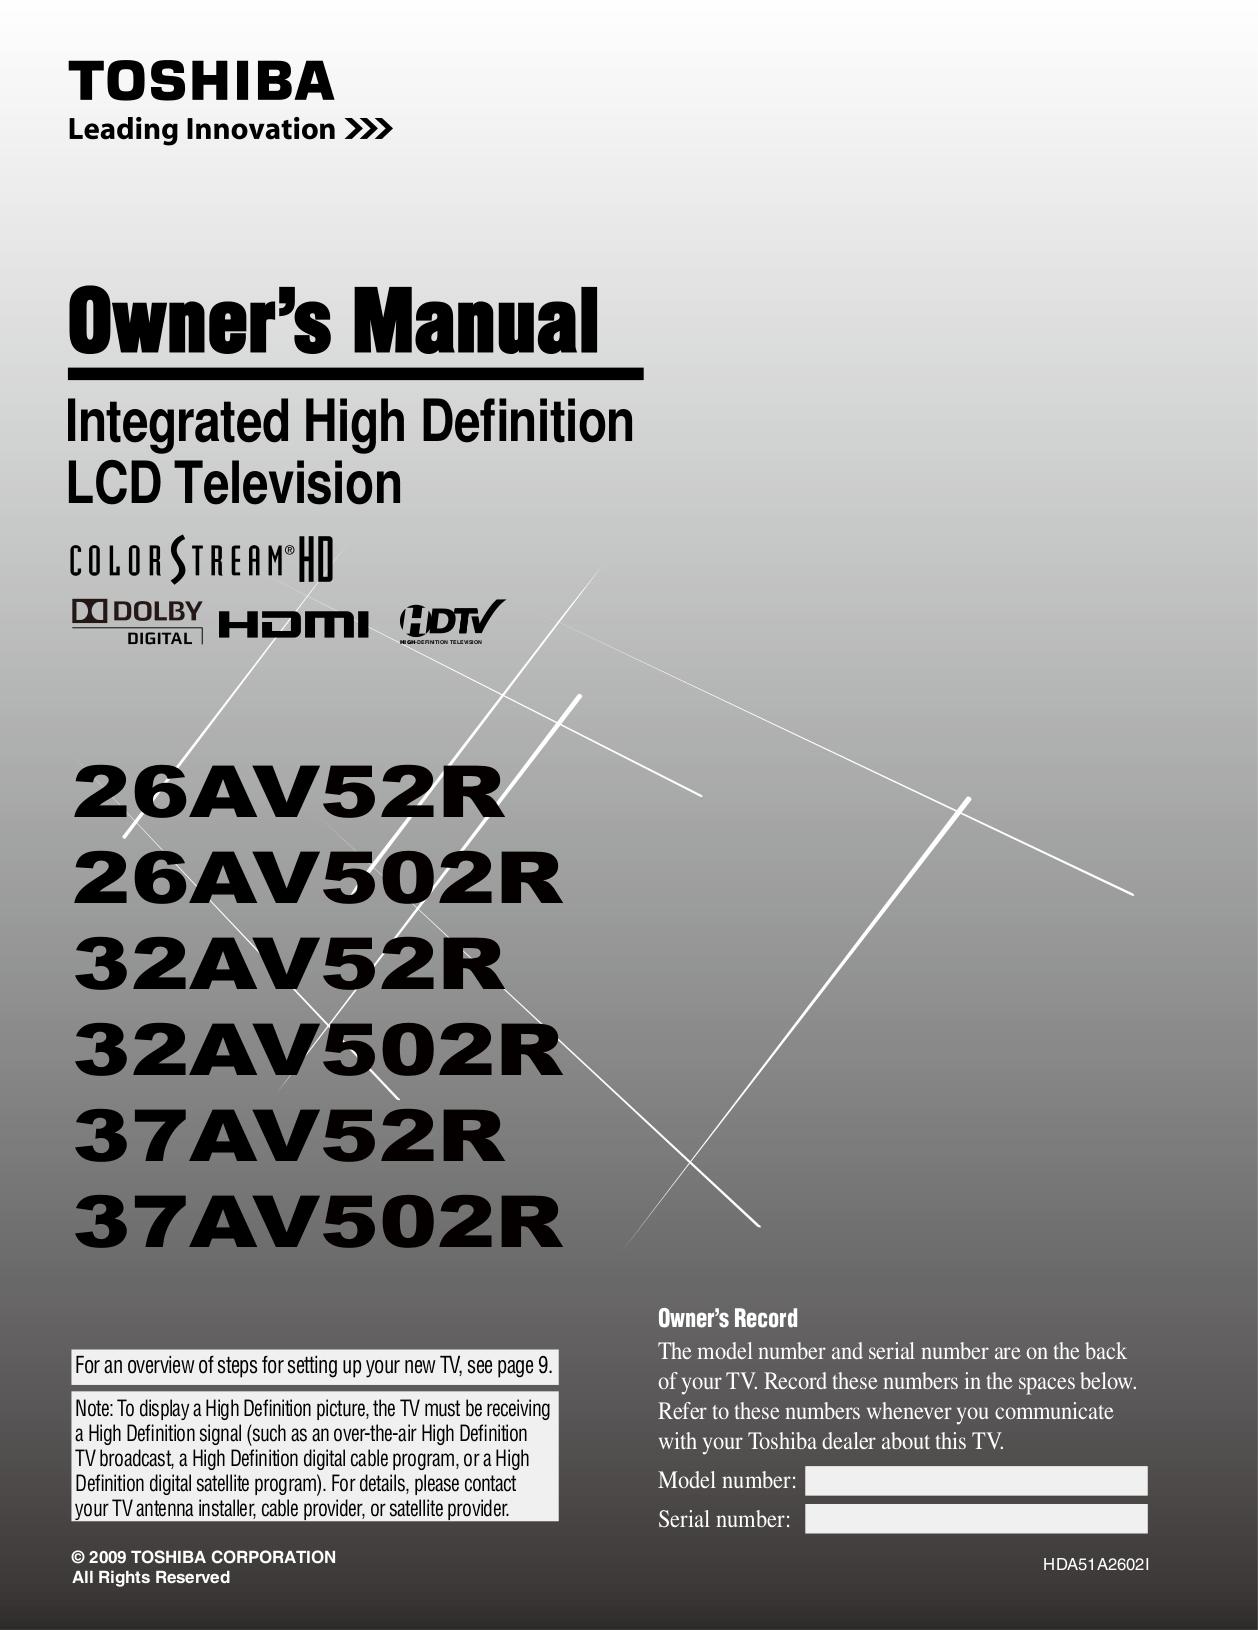 Toshiba 30hf84 service manual pdf download.